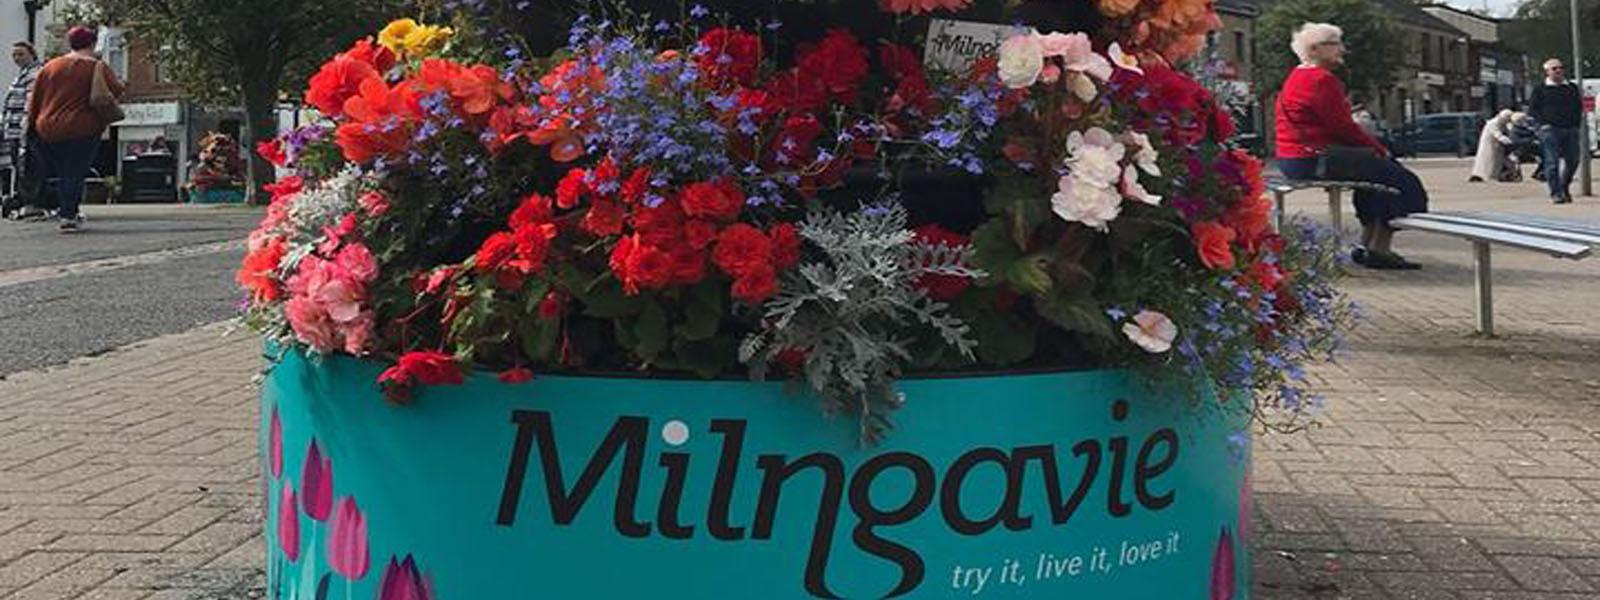 MilngavieBID.com